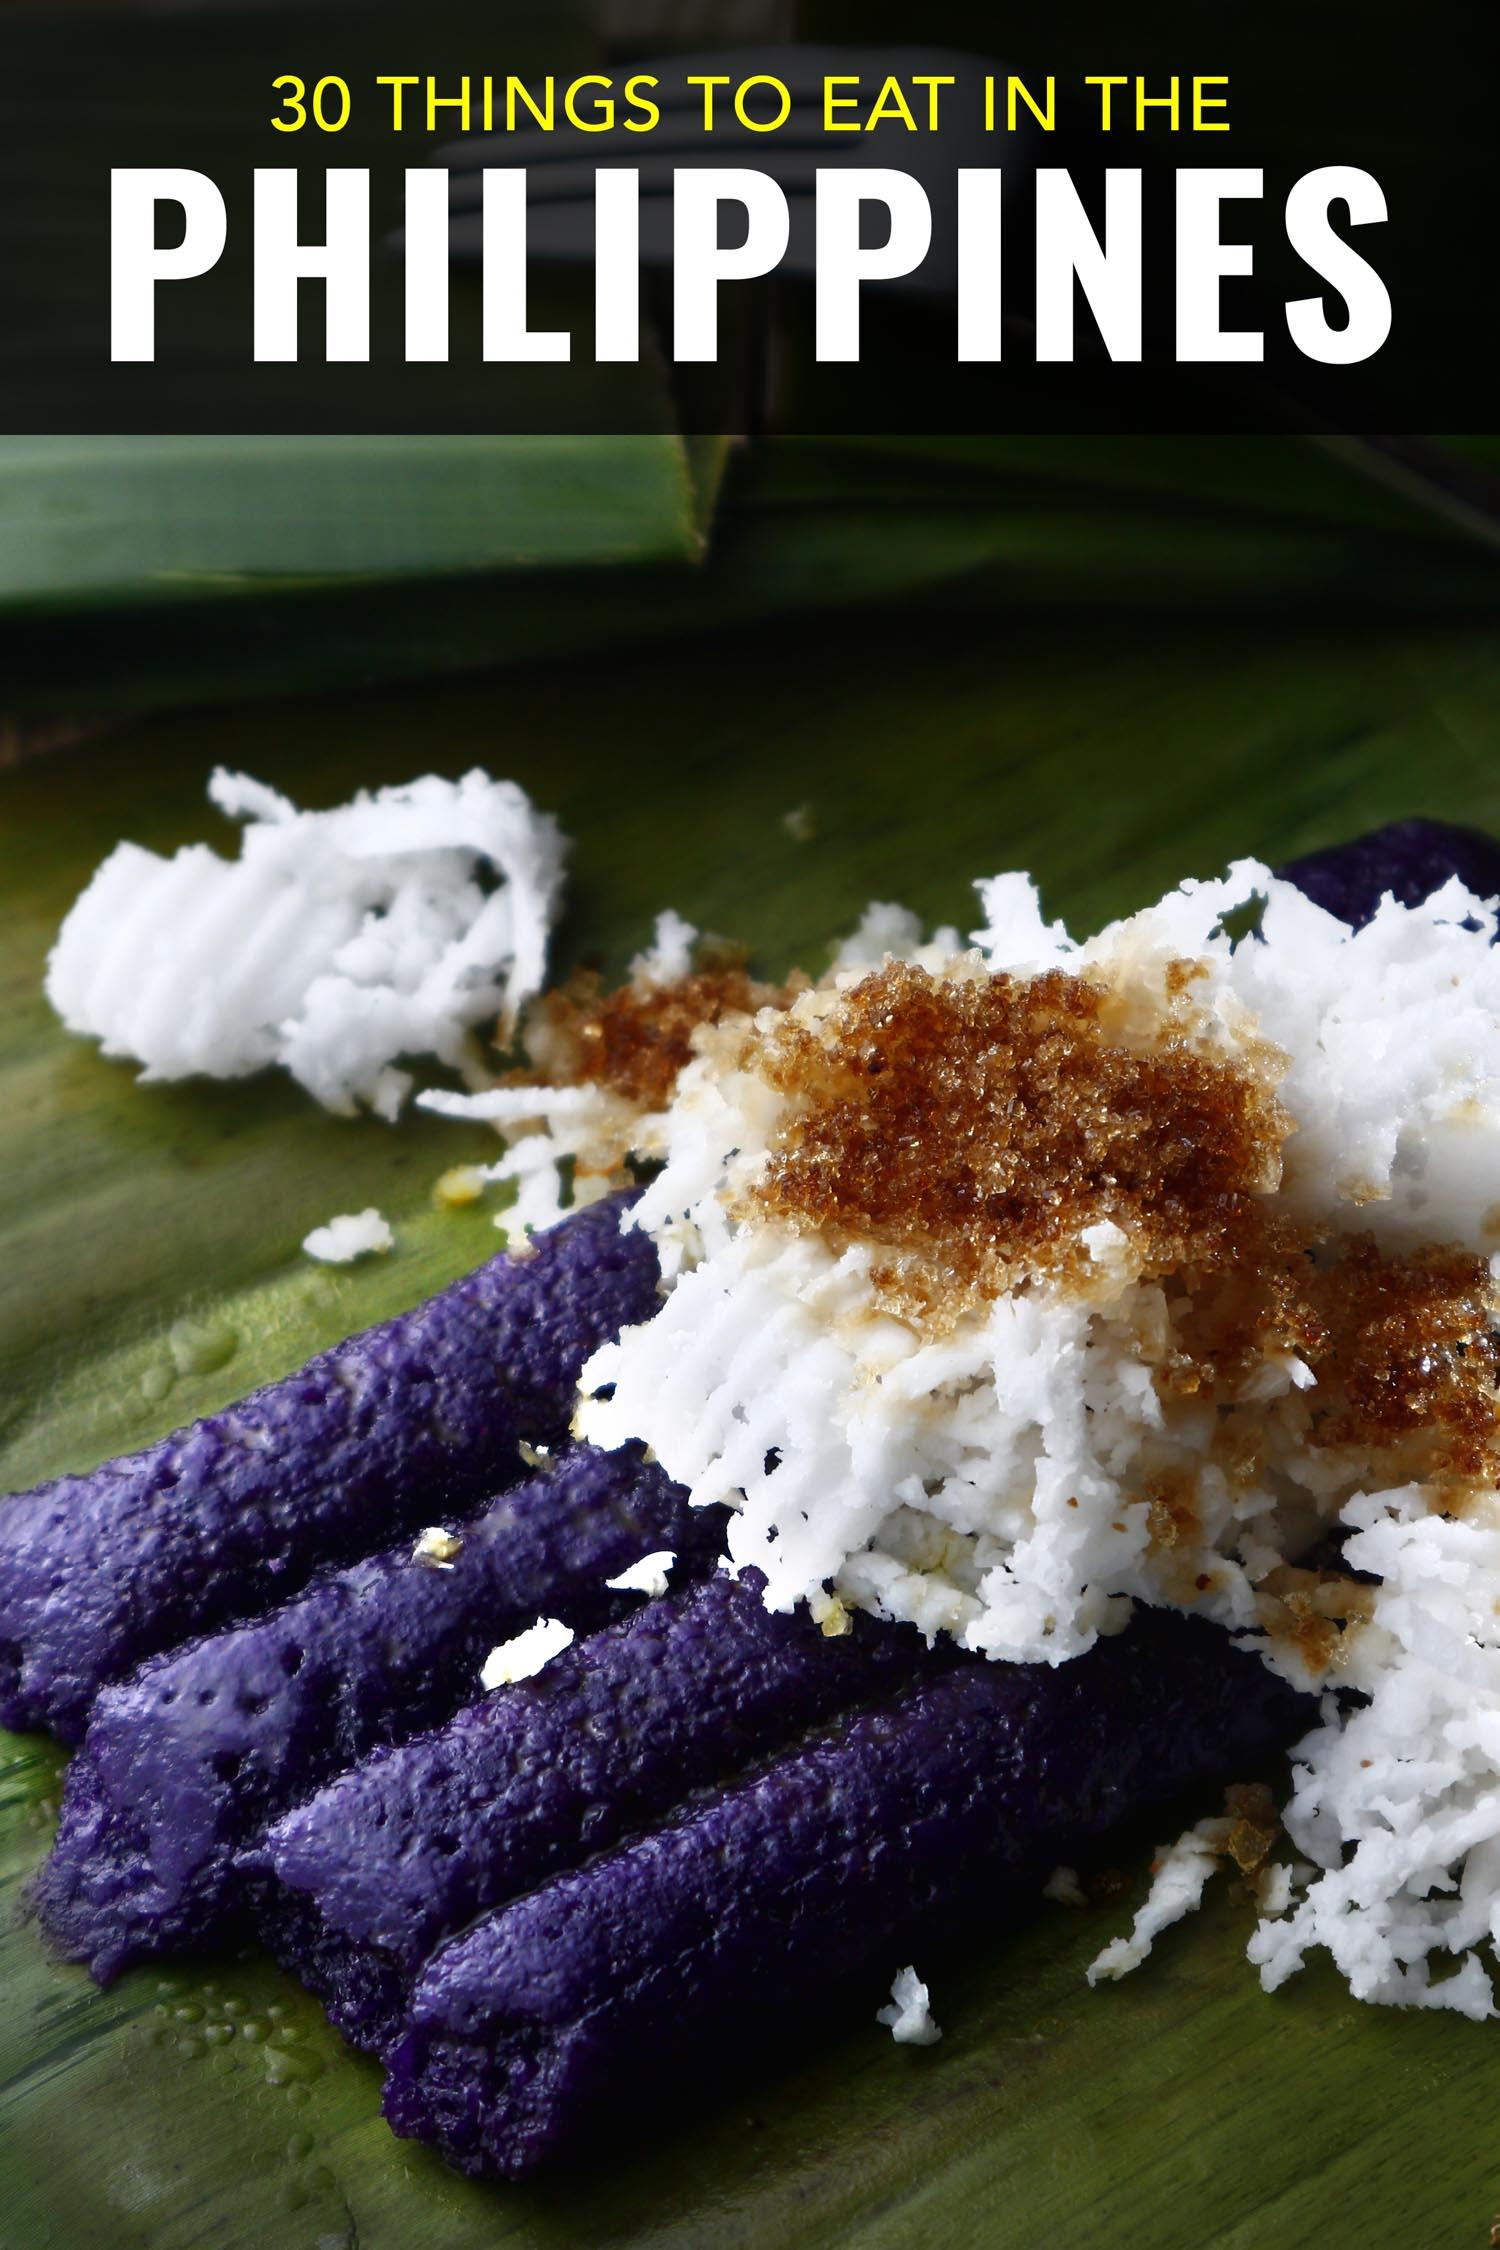 ube and sticky rice on a banana leaf